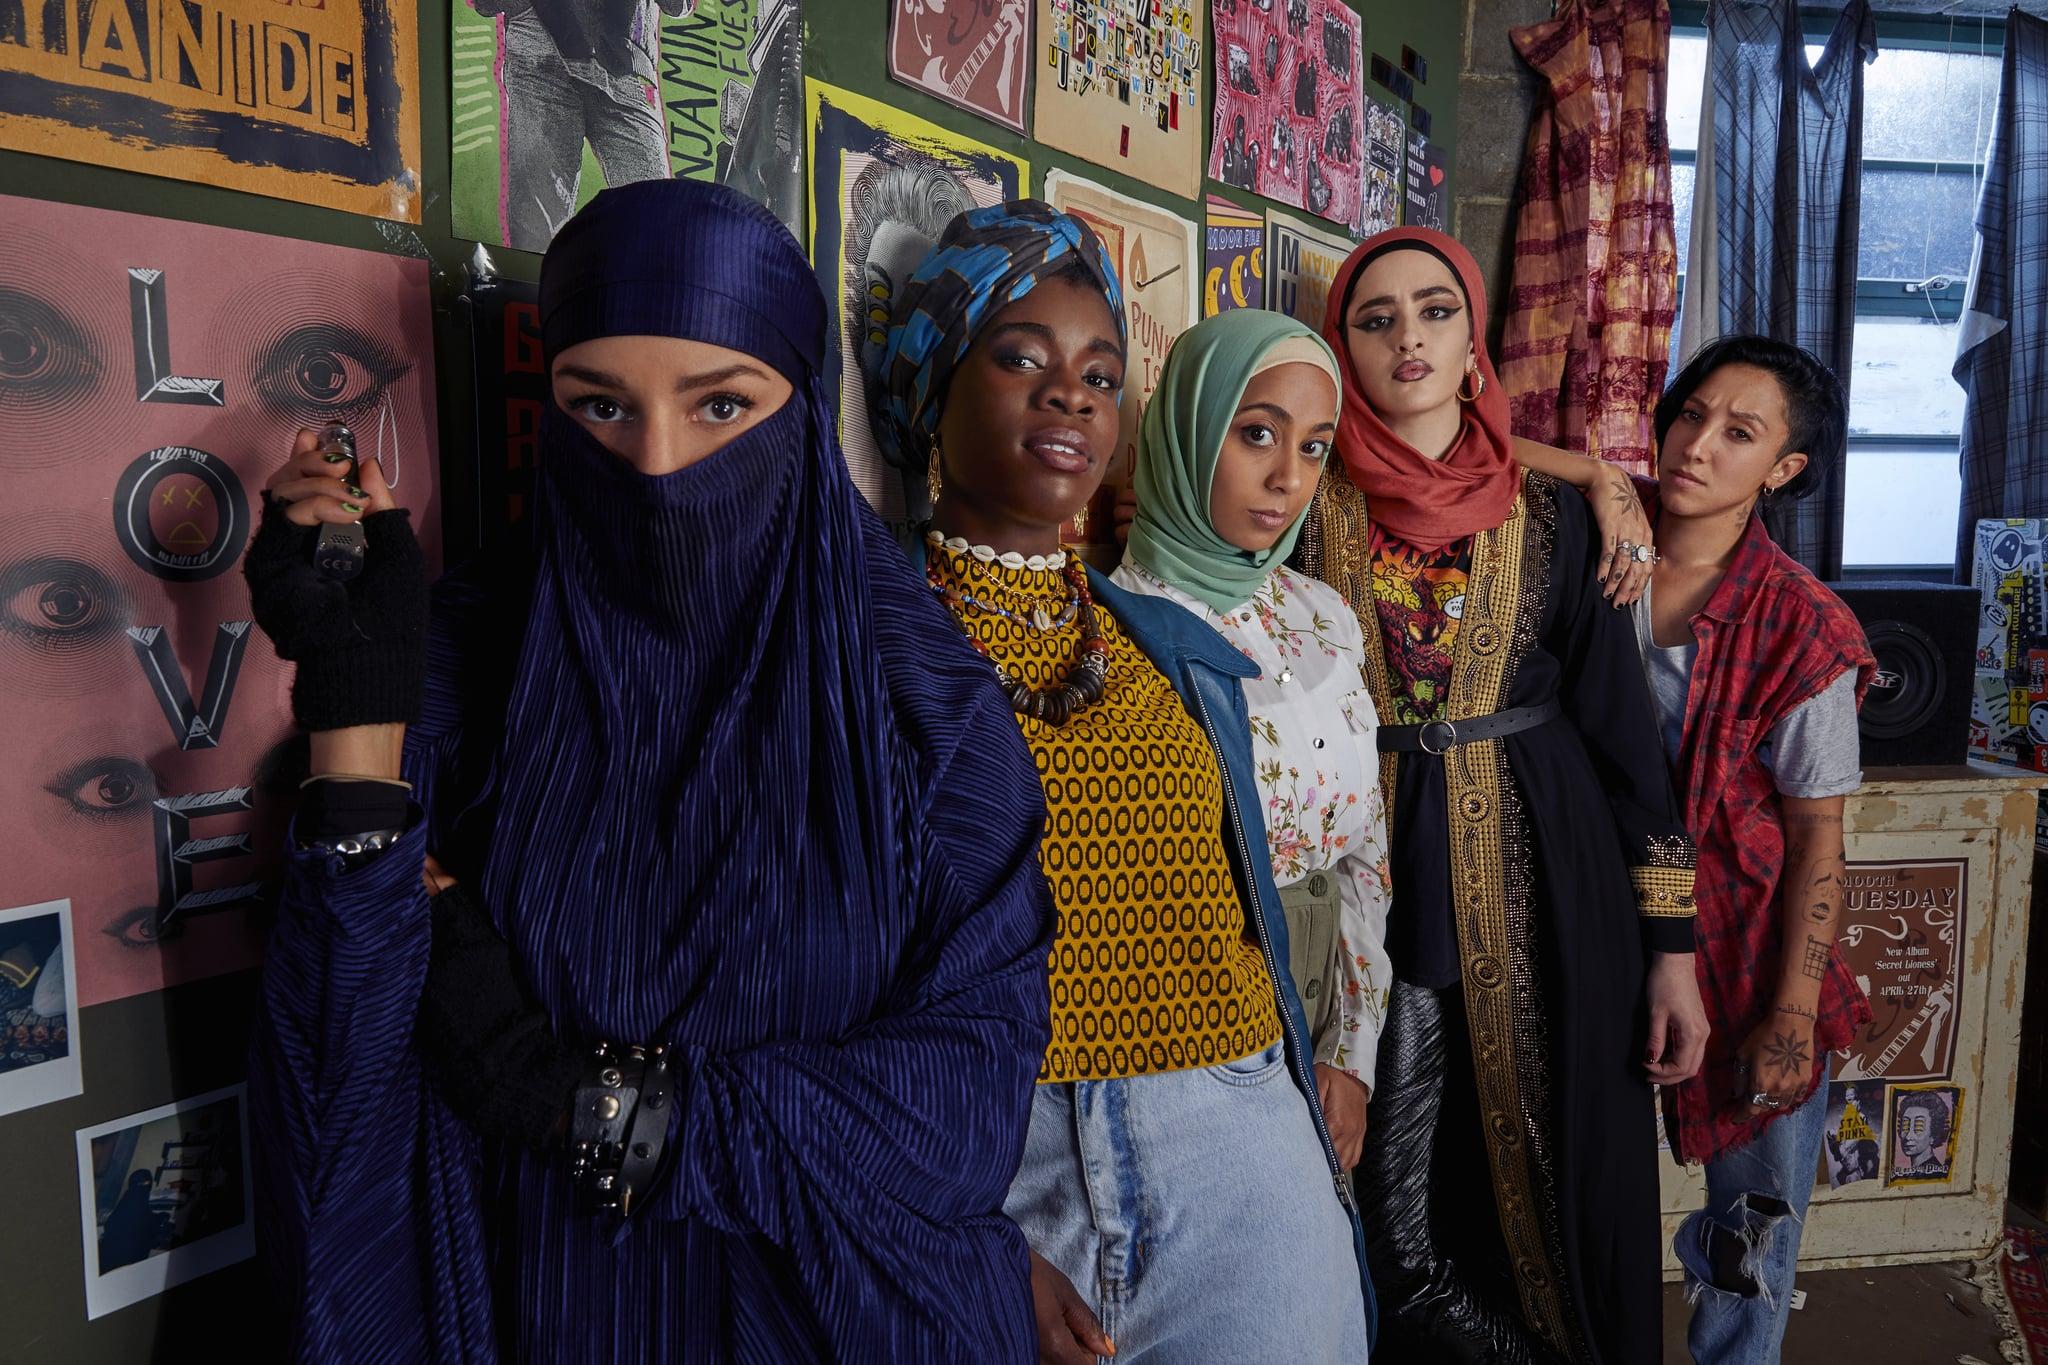 L-R - Lucie Shorthouse (Momtaz), Faith Omole (Bisma), Anjana Vasan (Amina), Juliette Motamed (Ayesha),  Sarah Impey (Saira)